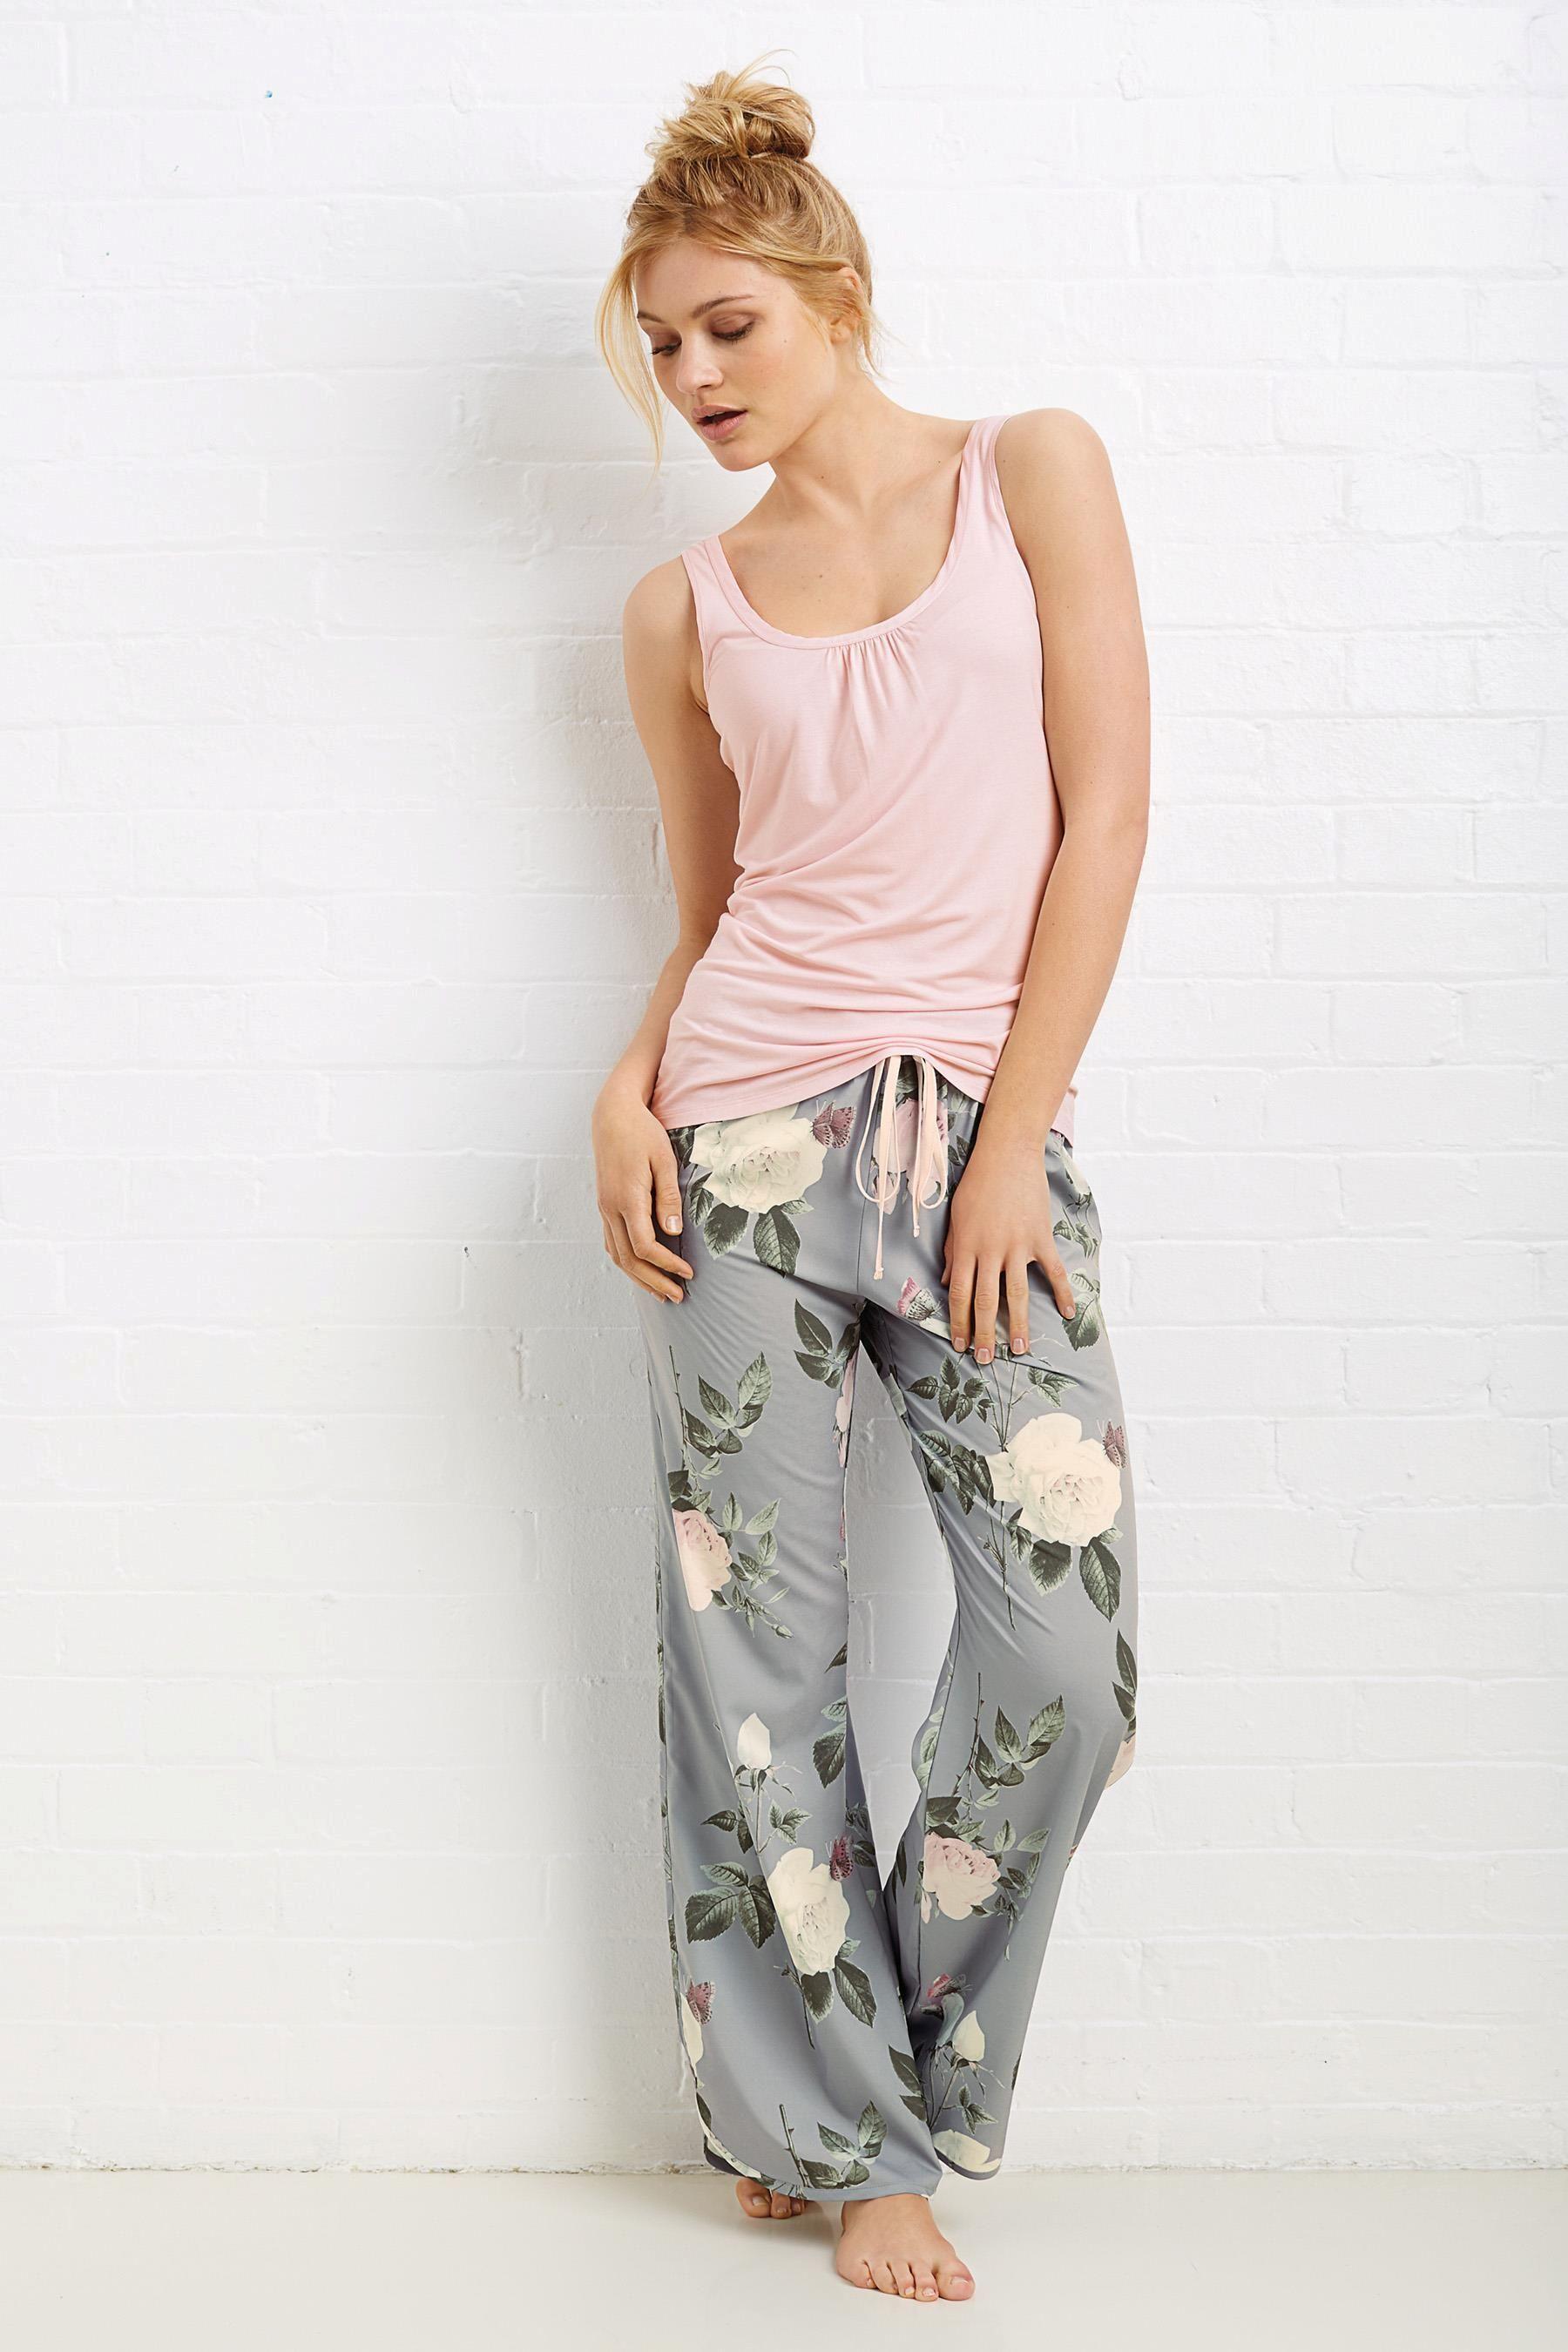 32ddf1c6ddc0 Buy Grey Print Pyjamas from the Next UK online shop